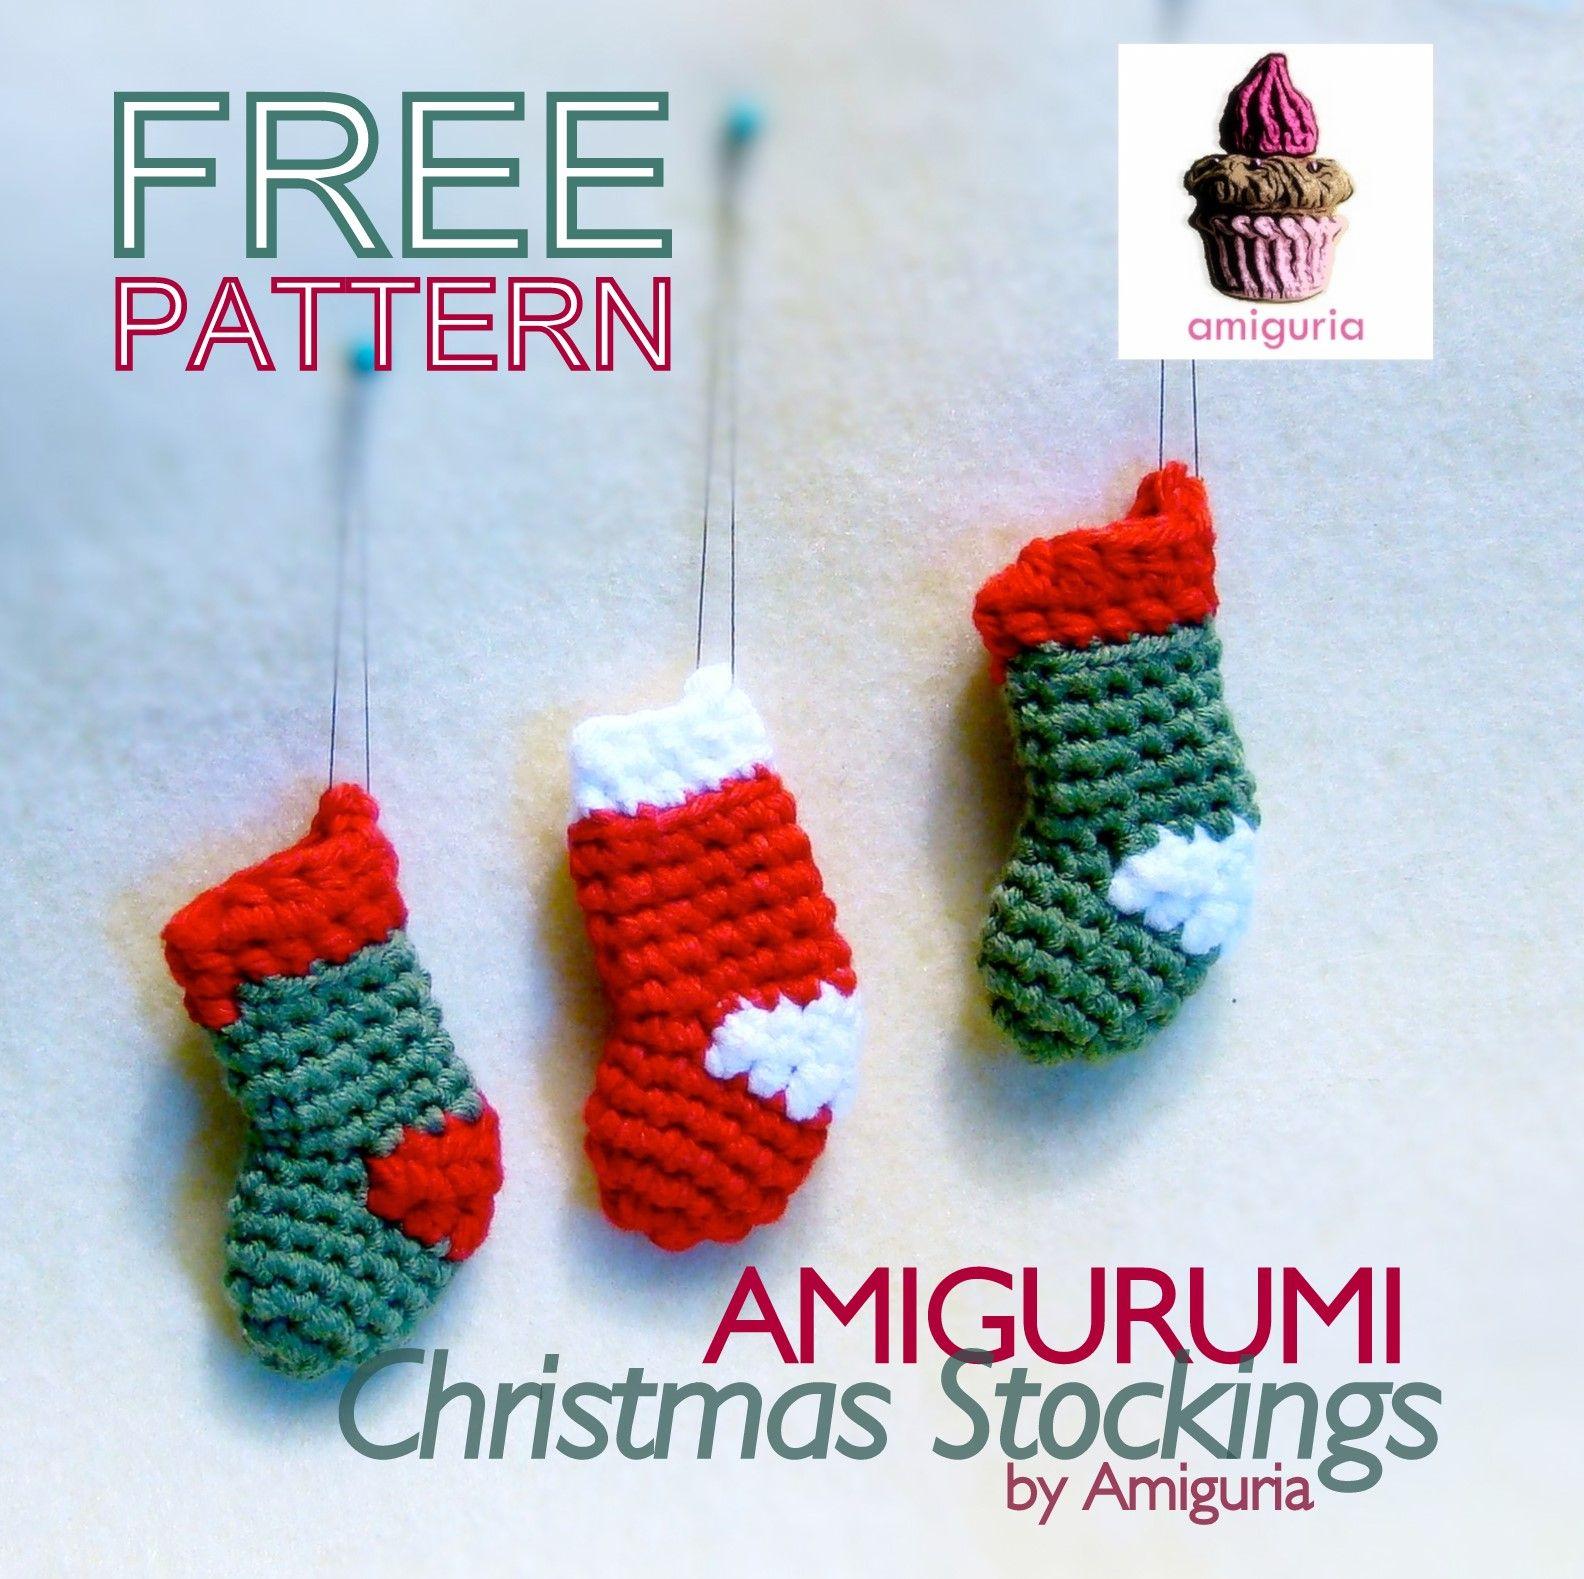 amiguria amigurumi: Free Pattern Christmas Stocking | Crochet ...